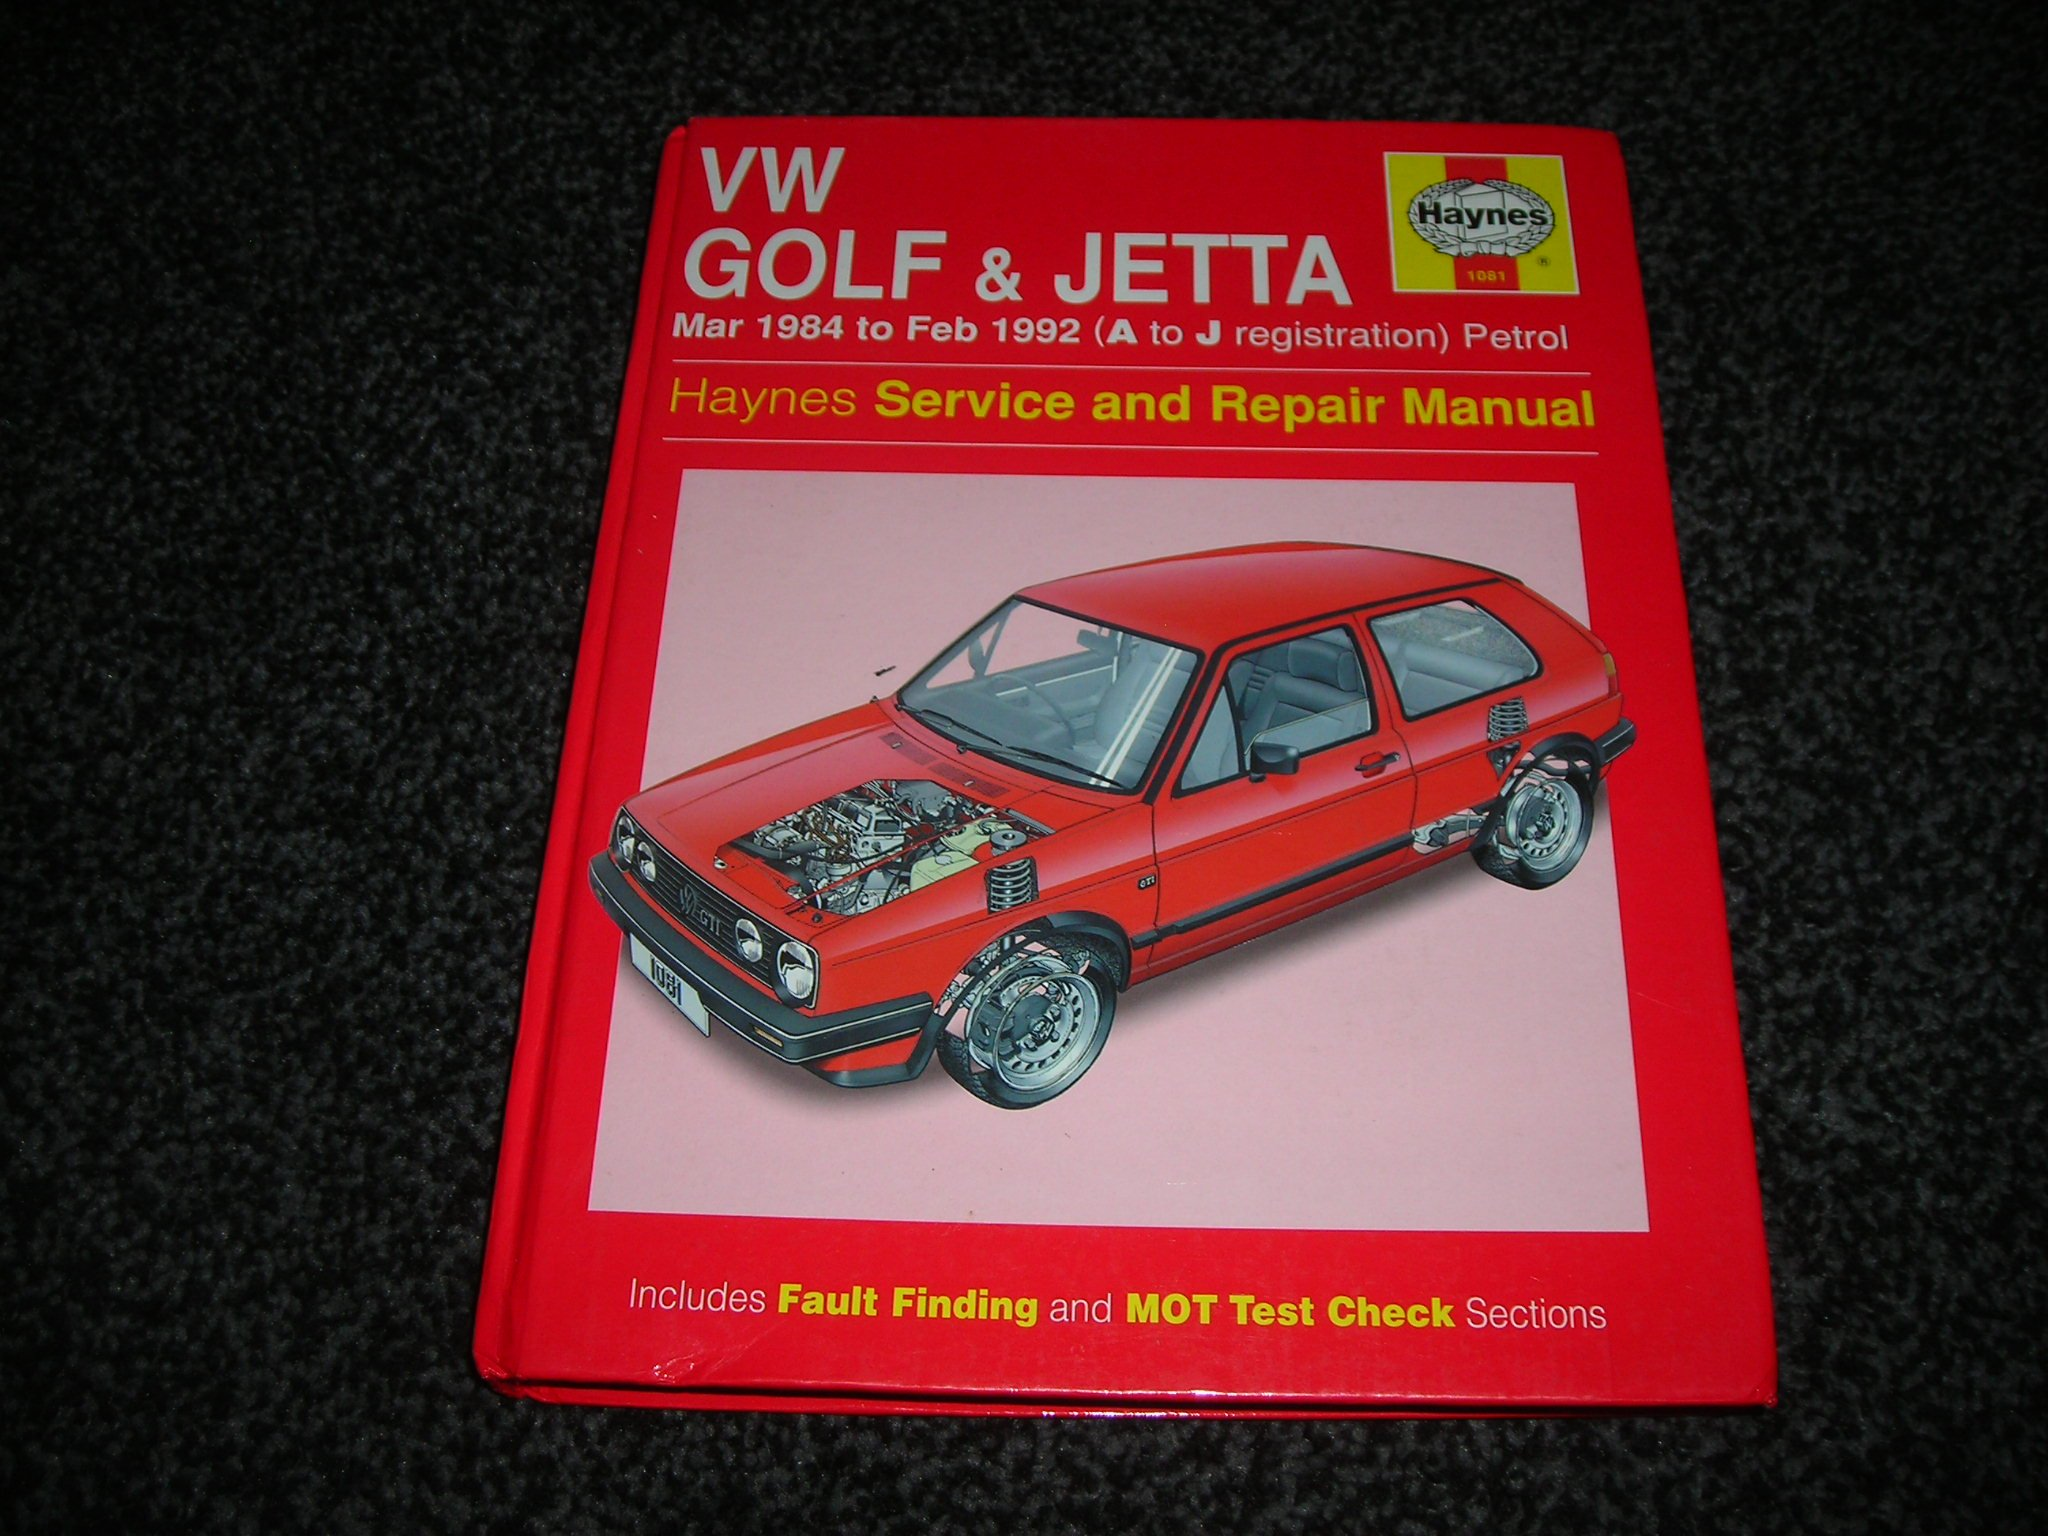 volkswagen golf and jetta 84 to 92 service and repair manual rh amazon com 1998 Volkswagen Jetta 1998 Volkswagen Jetta